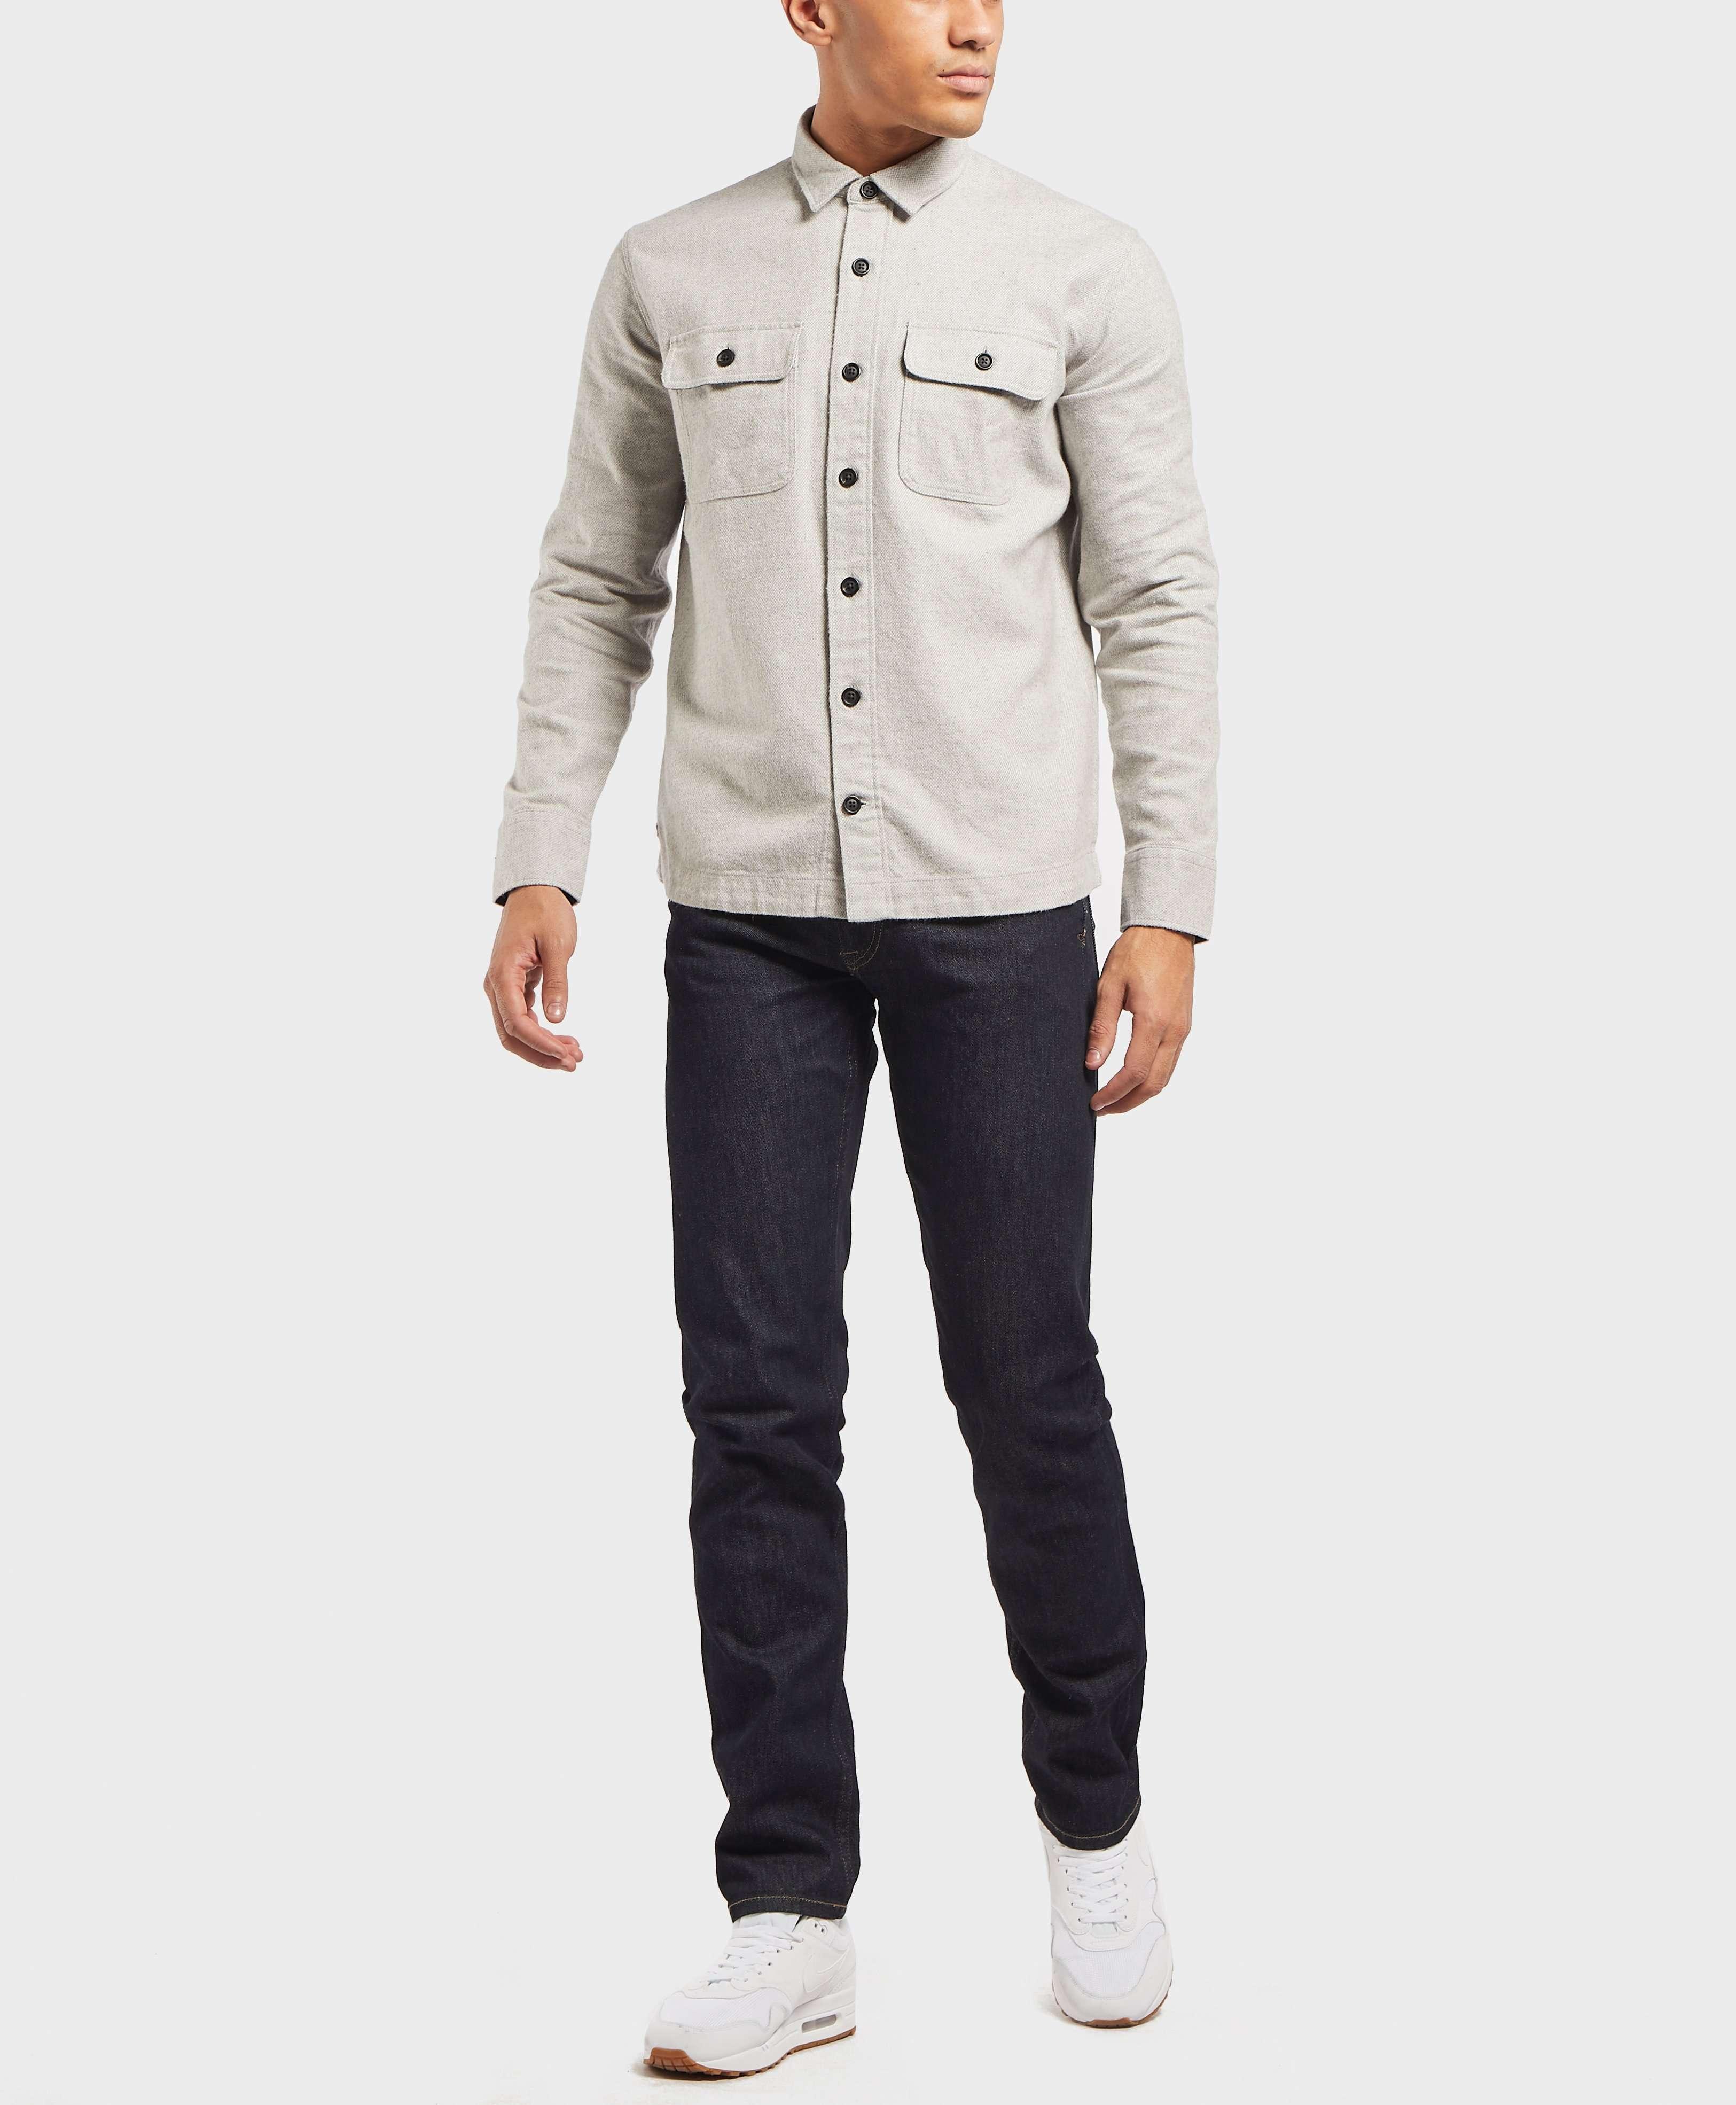 Lacoste Two Pocket Long Sleeve Overshirt